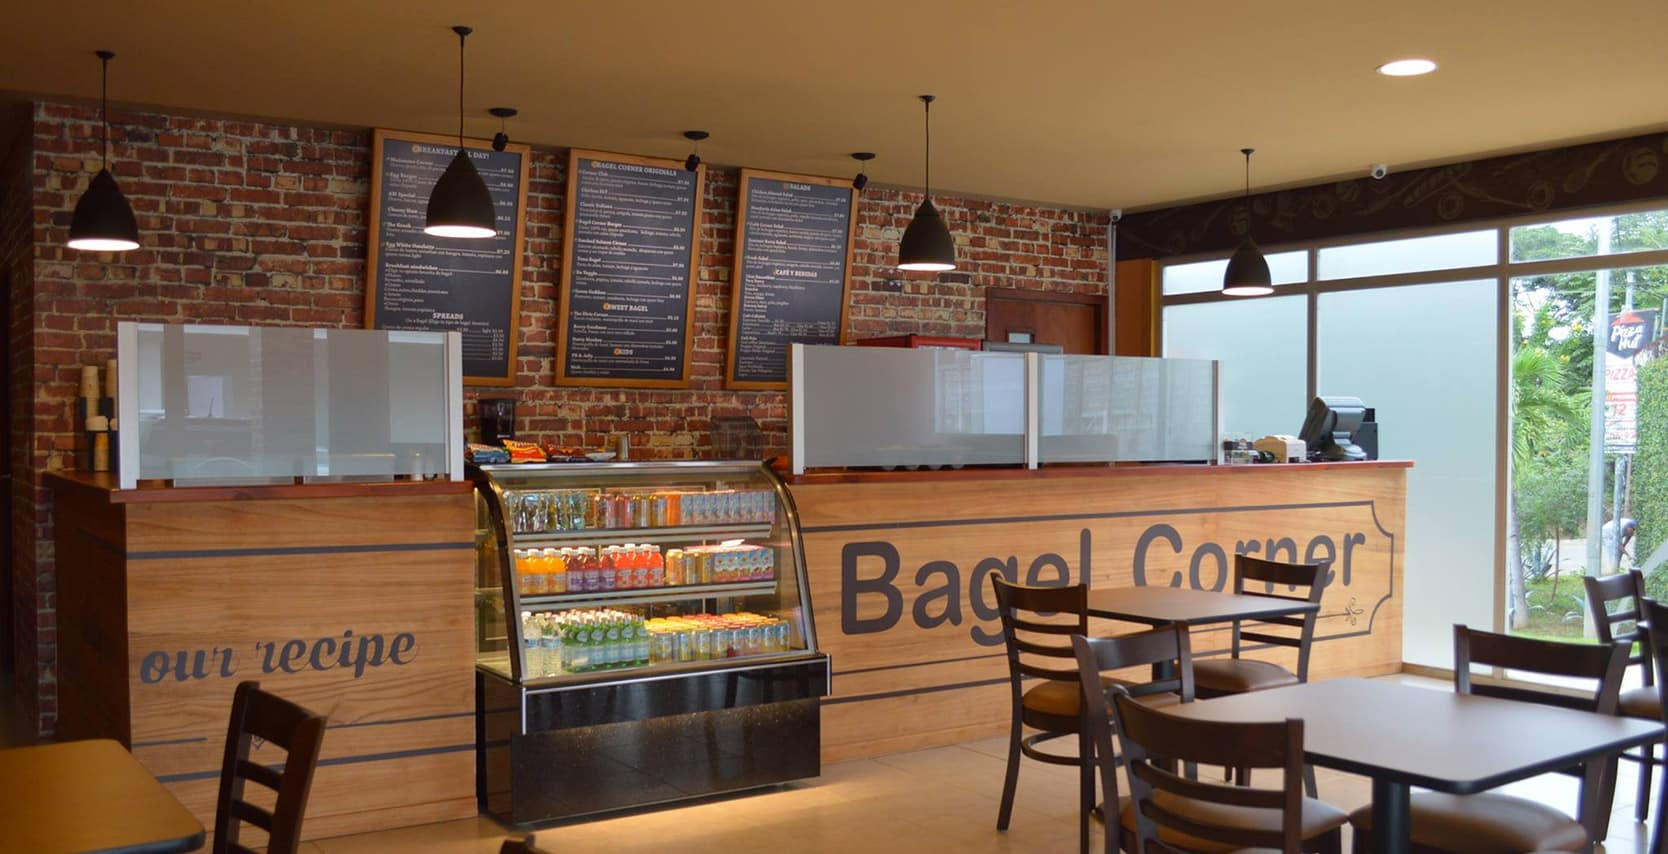 Bagel Corner